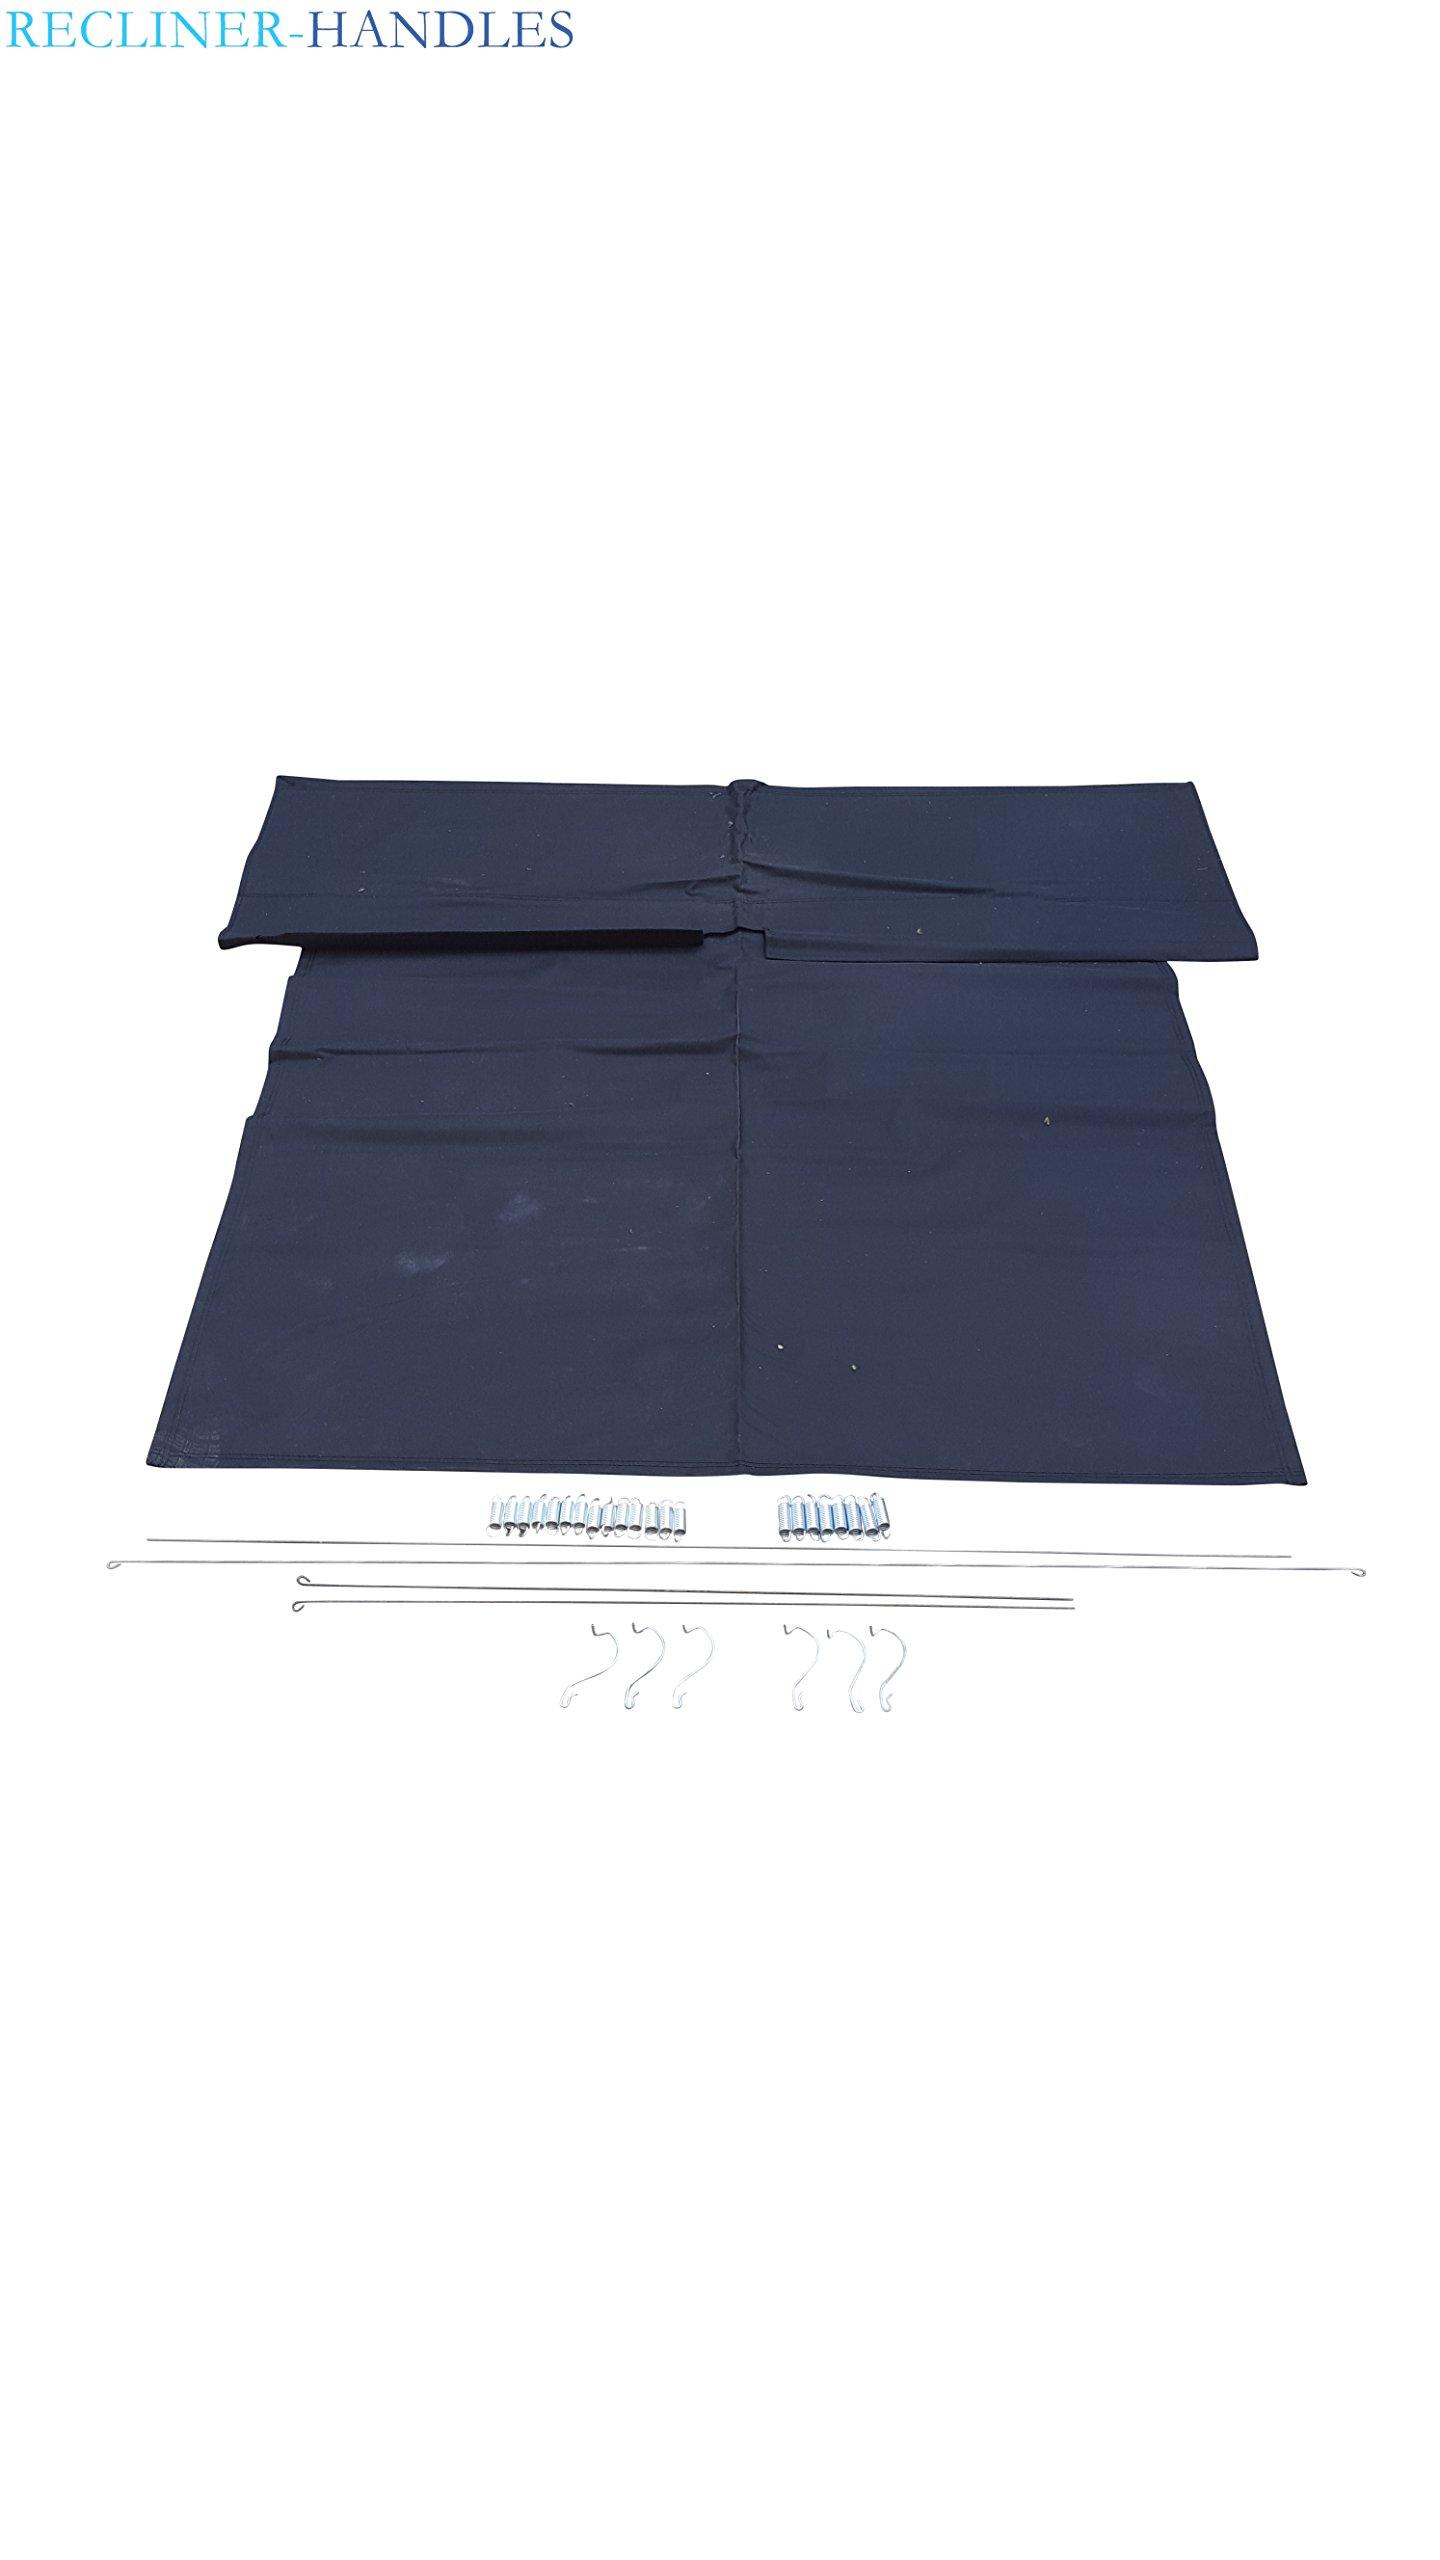 Sofa Sleeper Complete Bed Deck Repair Kit, Queen Residential 67 Inch Bed Deck, 900 Series